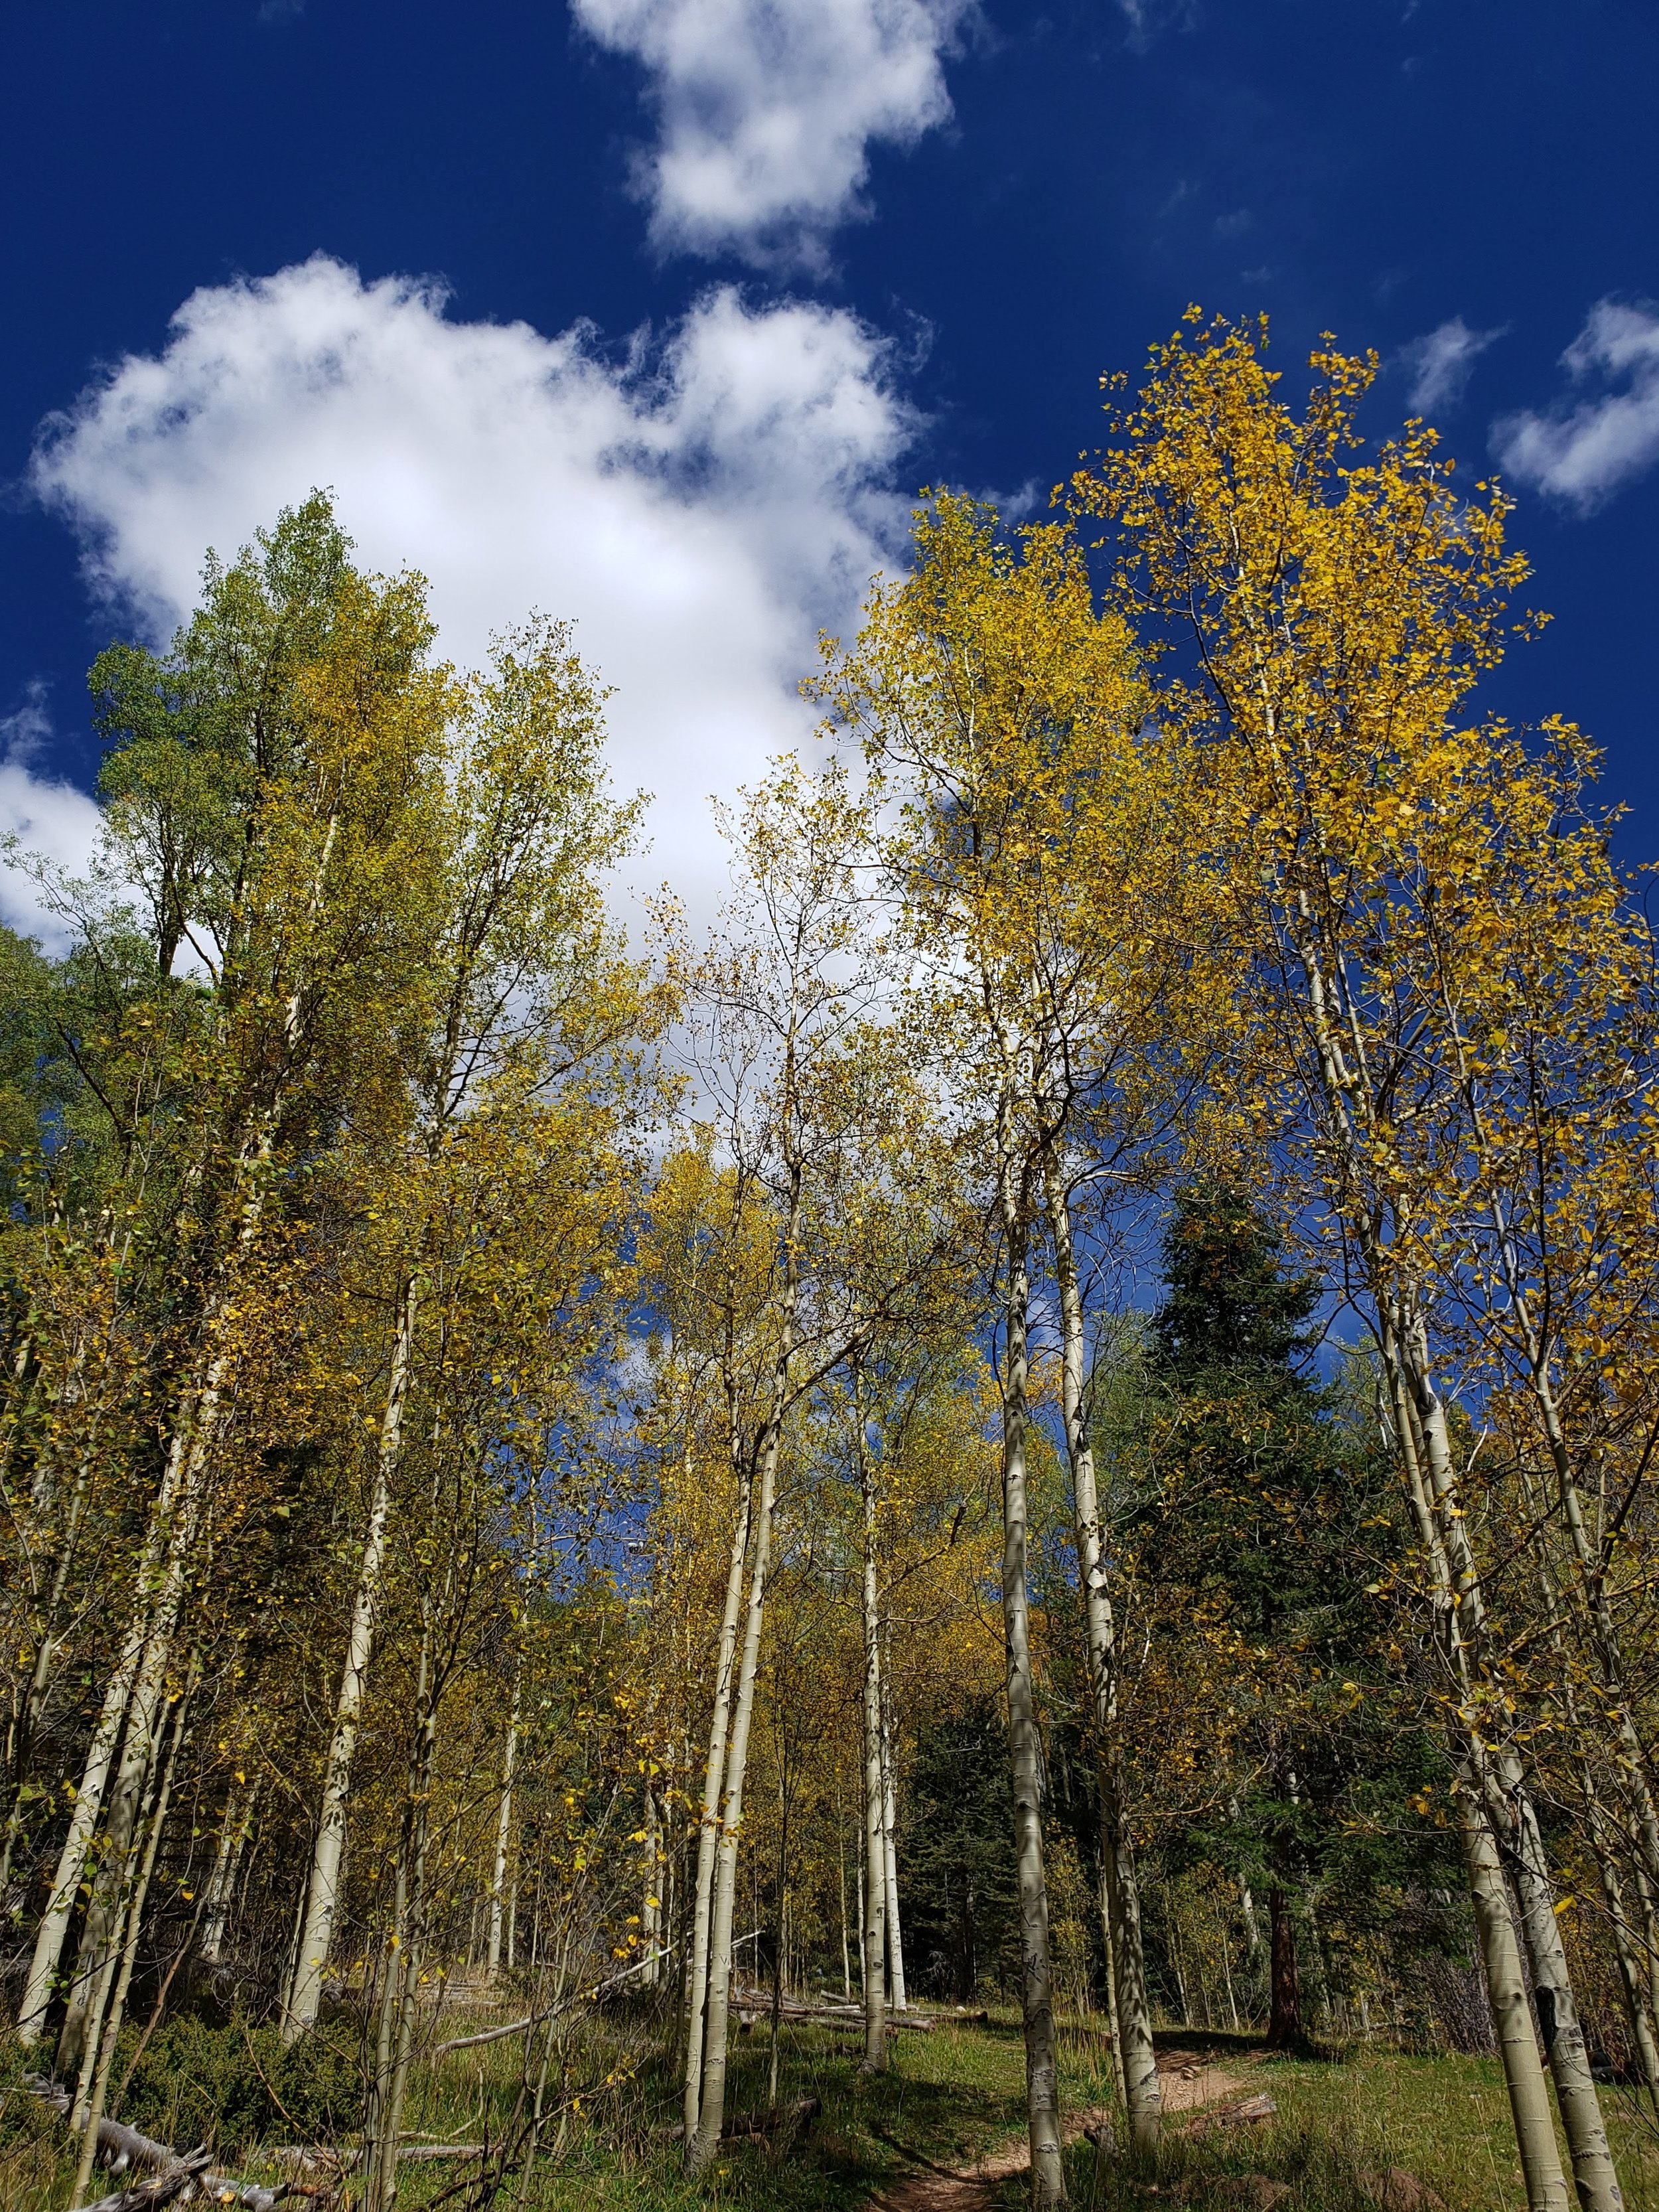 Hiking in Santa Fe National Forest - Aspens